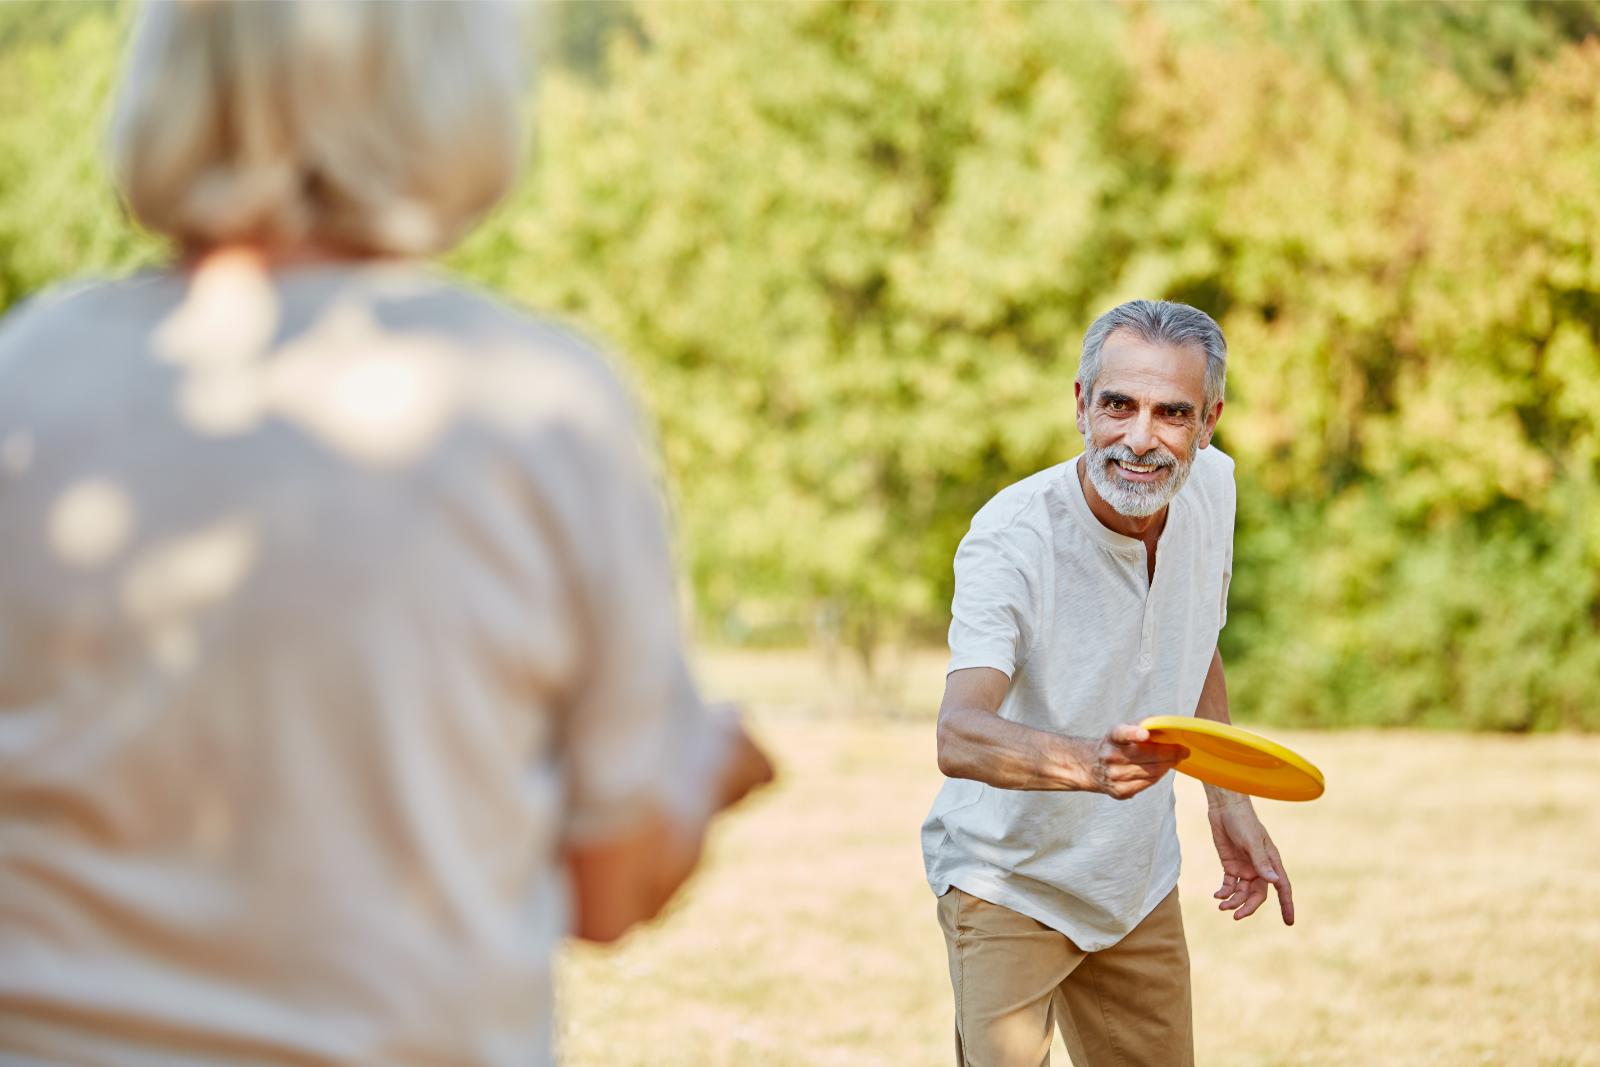 Fun Activities for Seniors to Keep Active